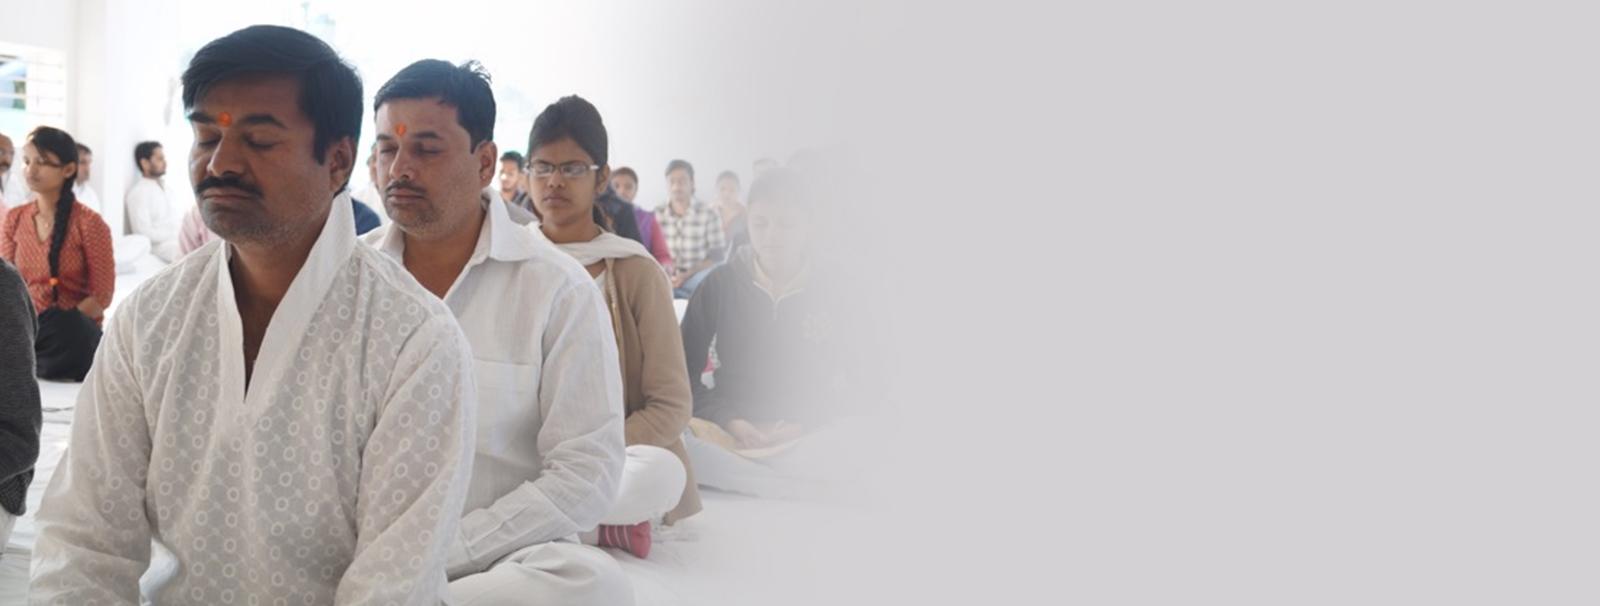 life management through medtation